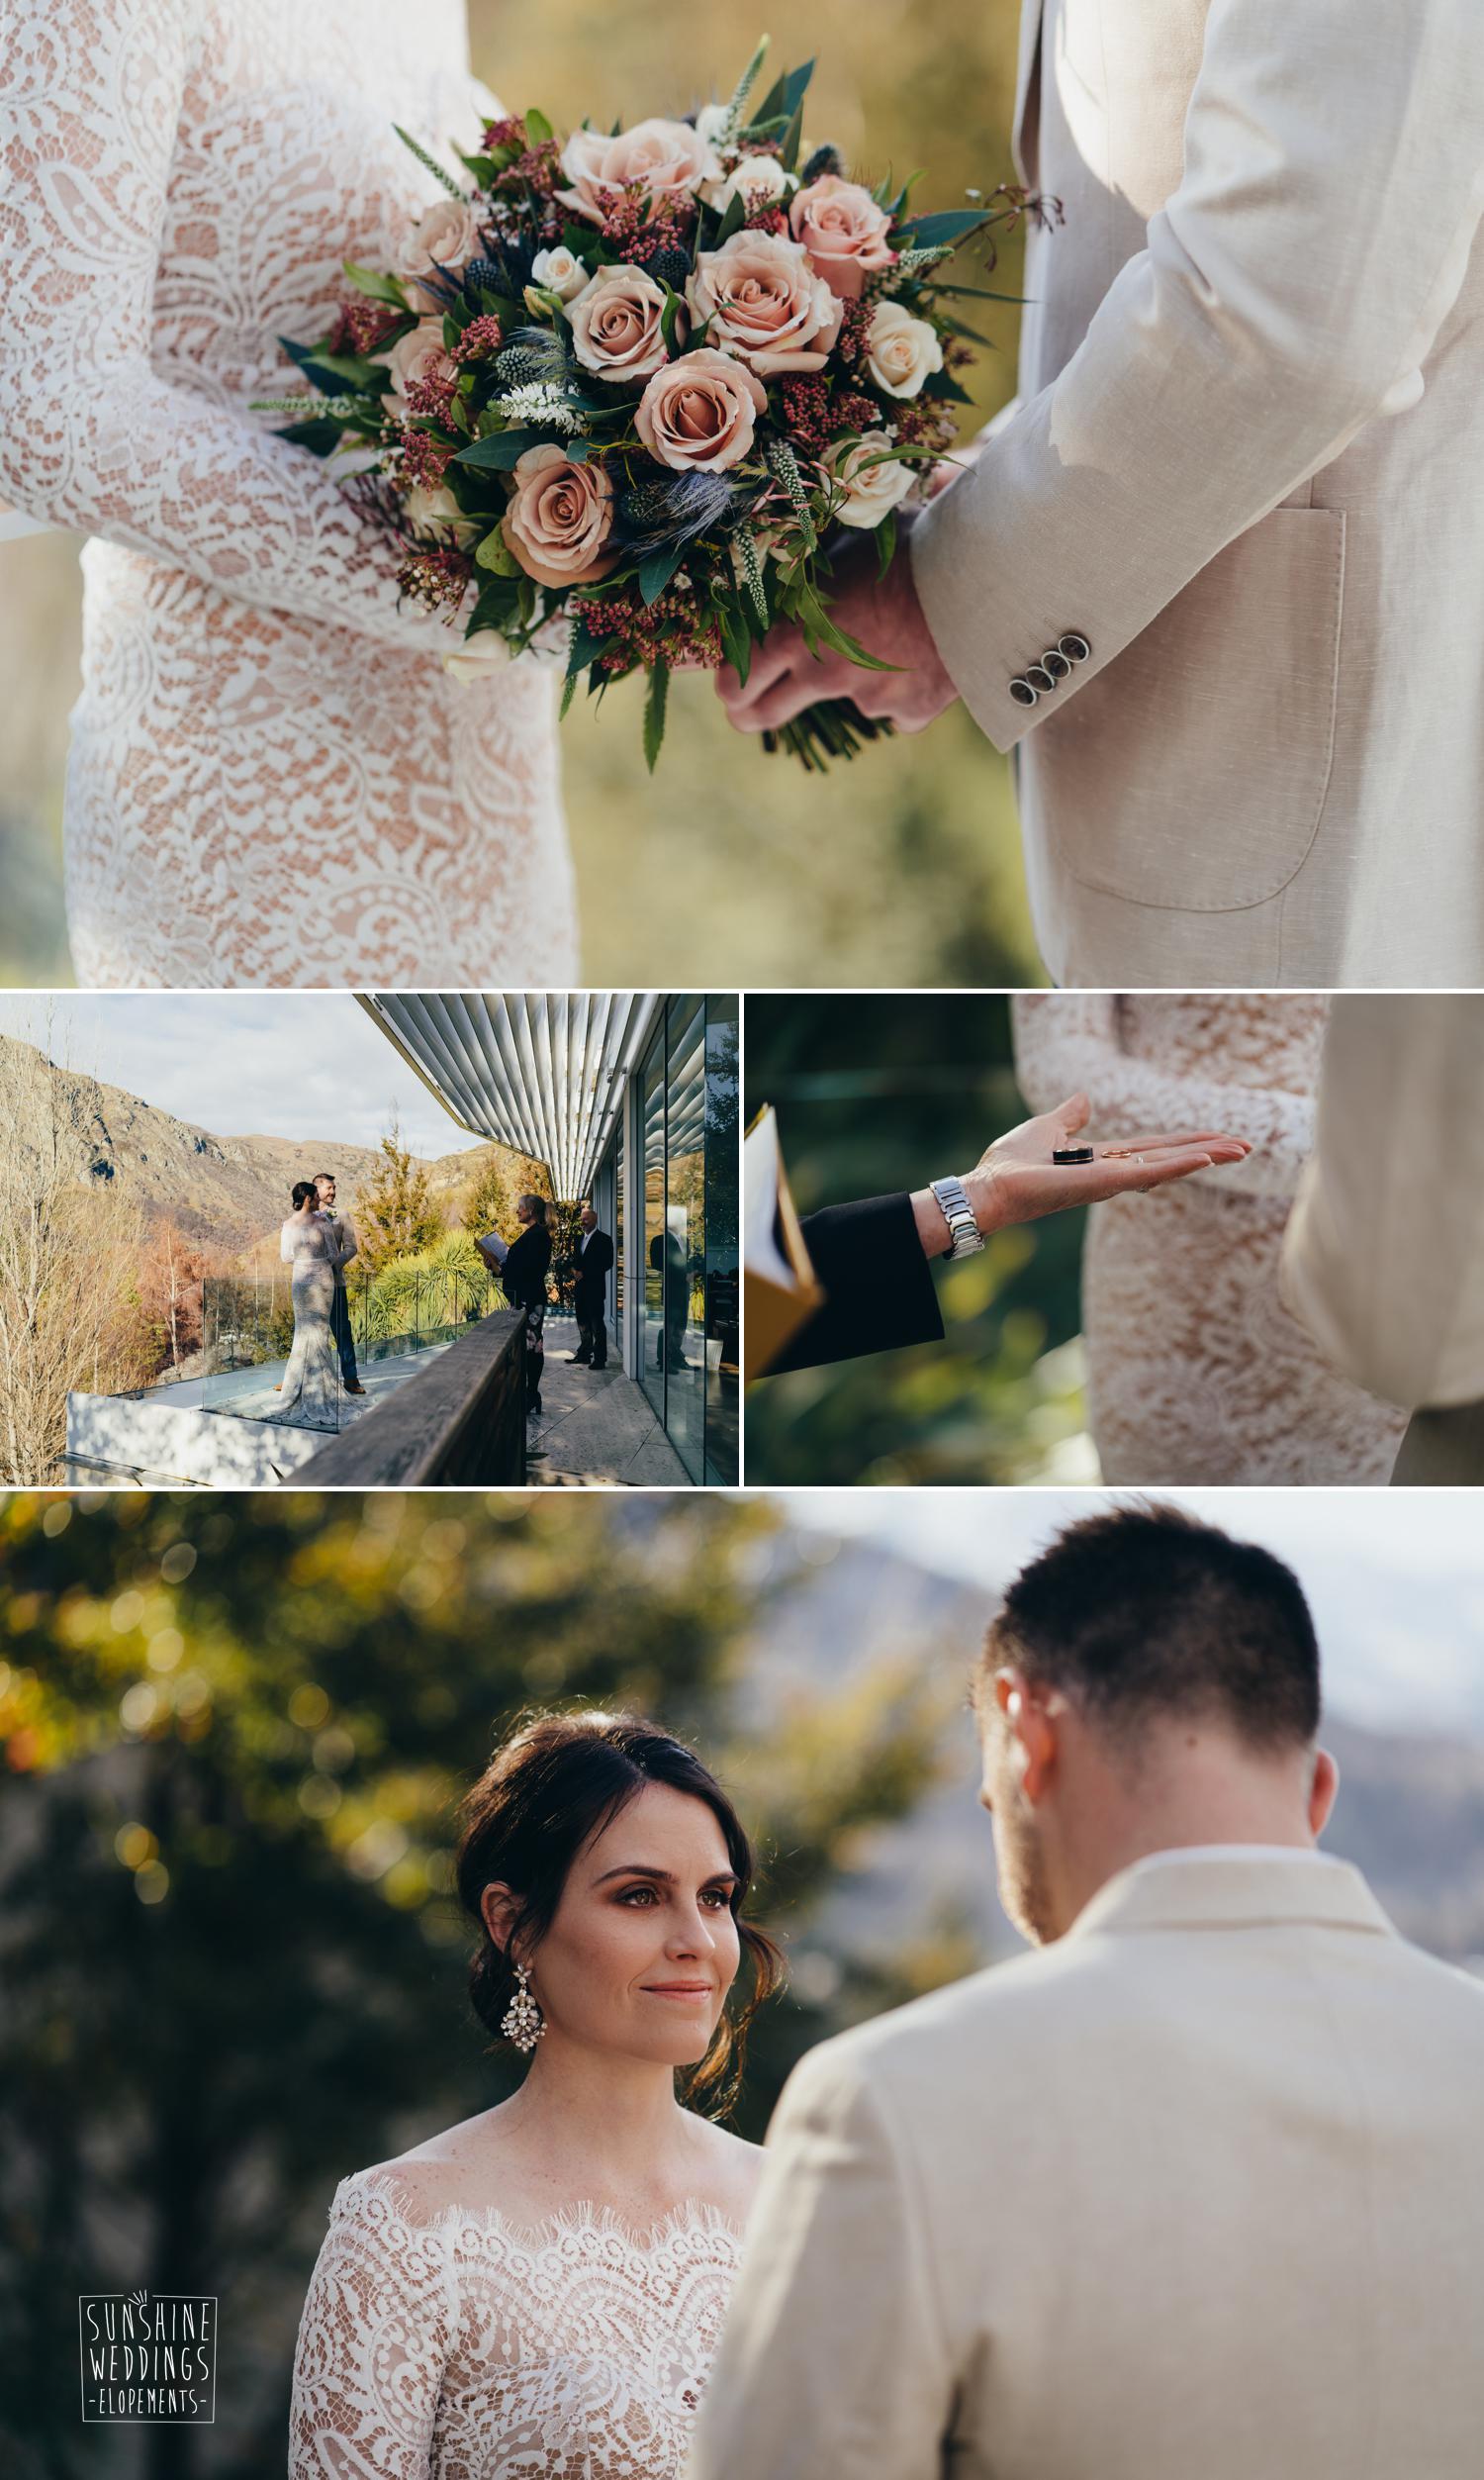 Secret elopement wedding